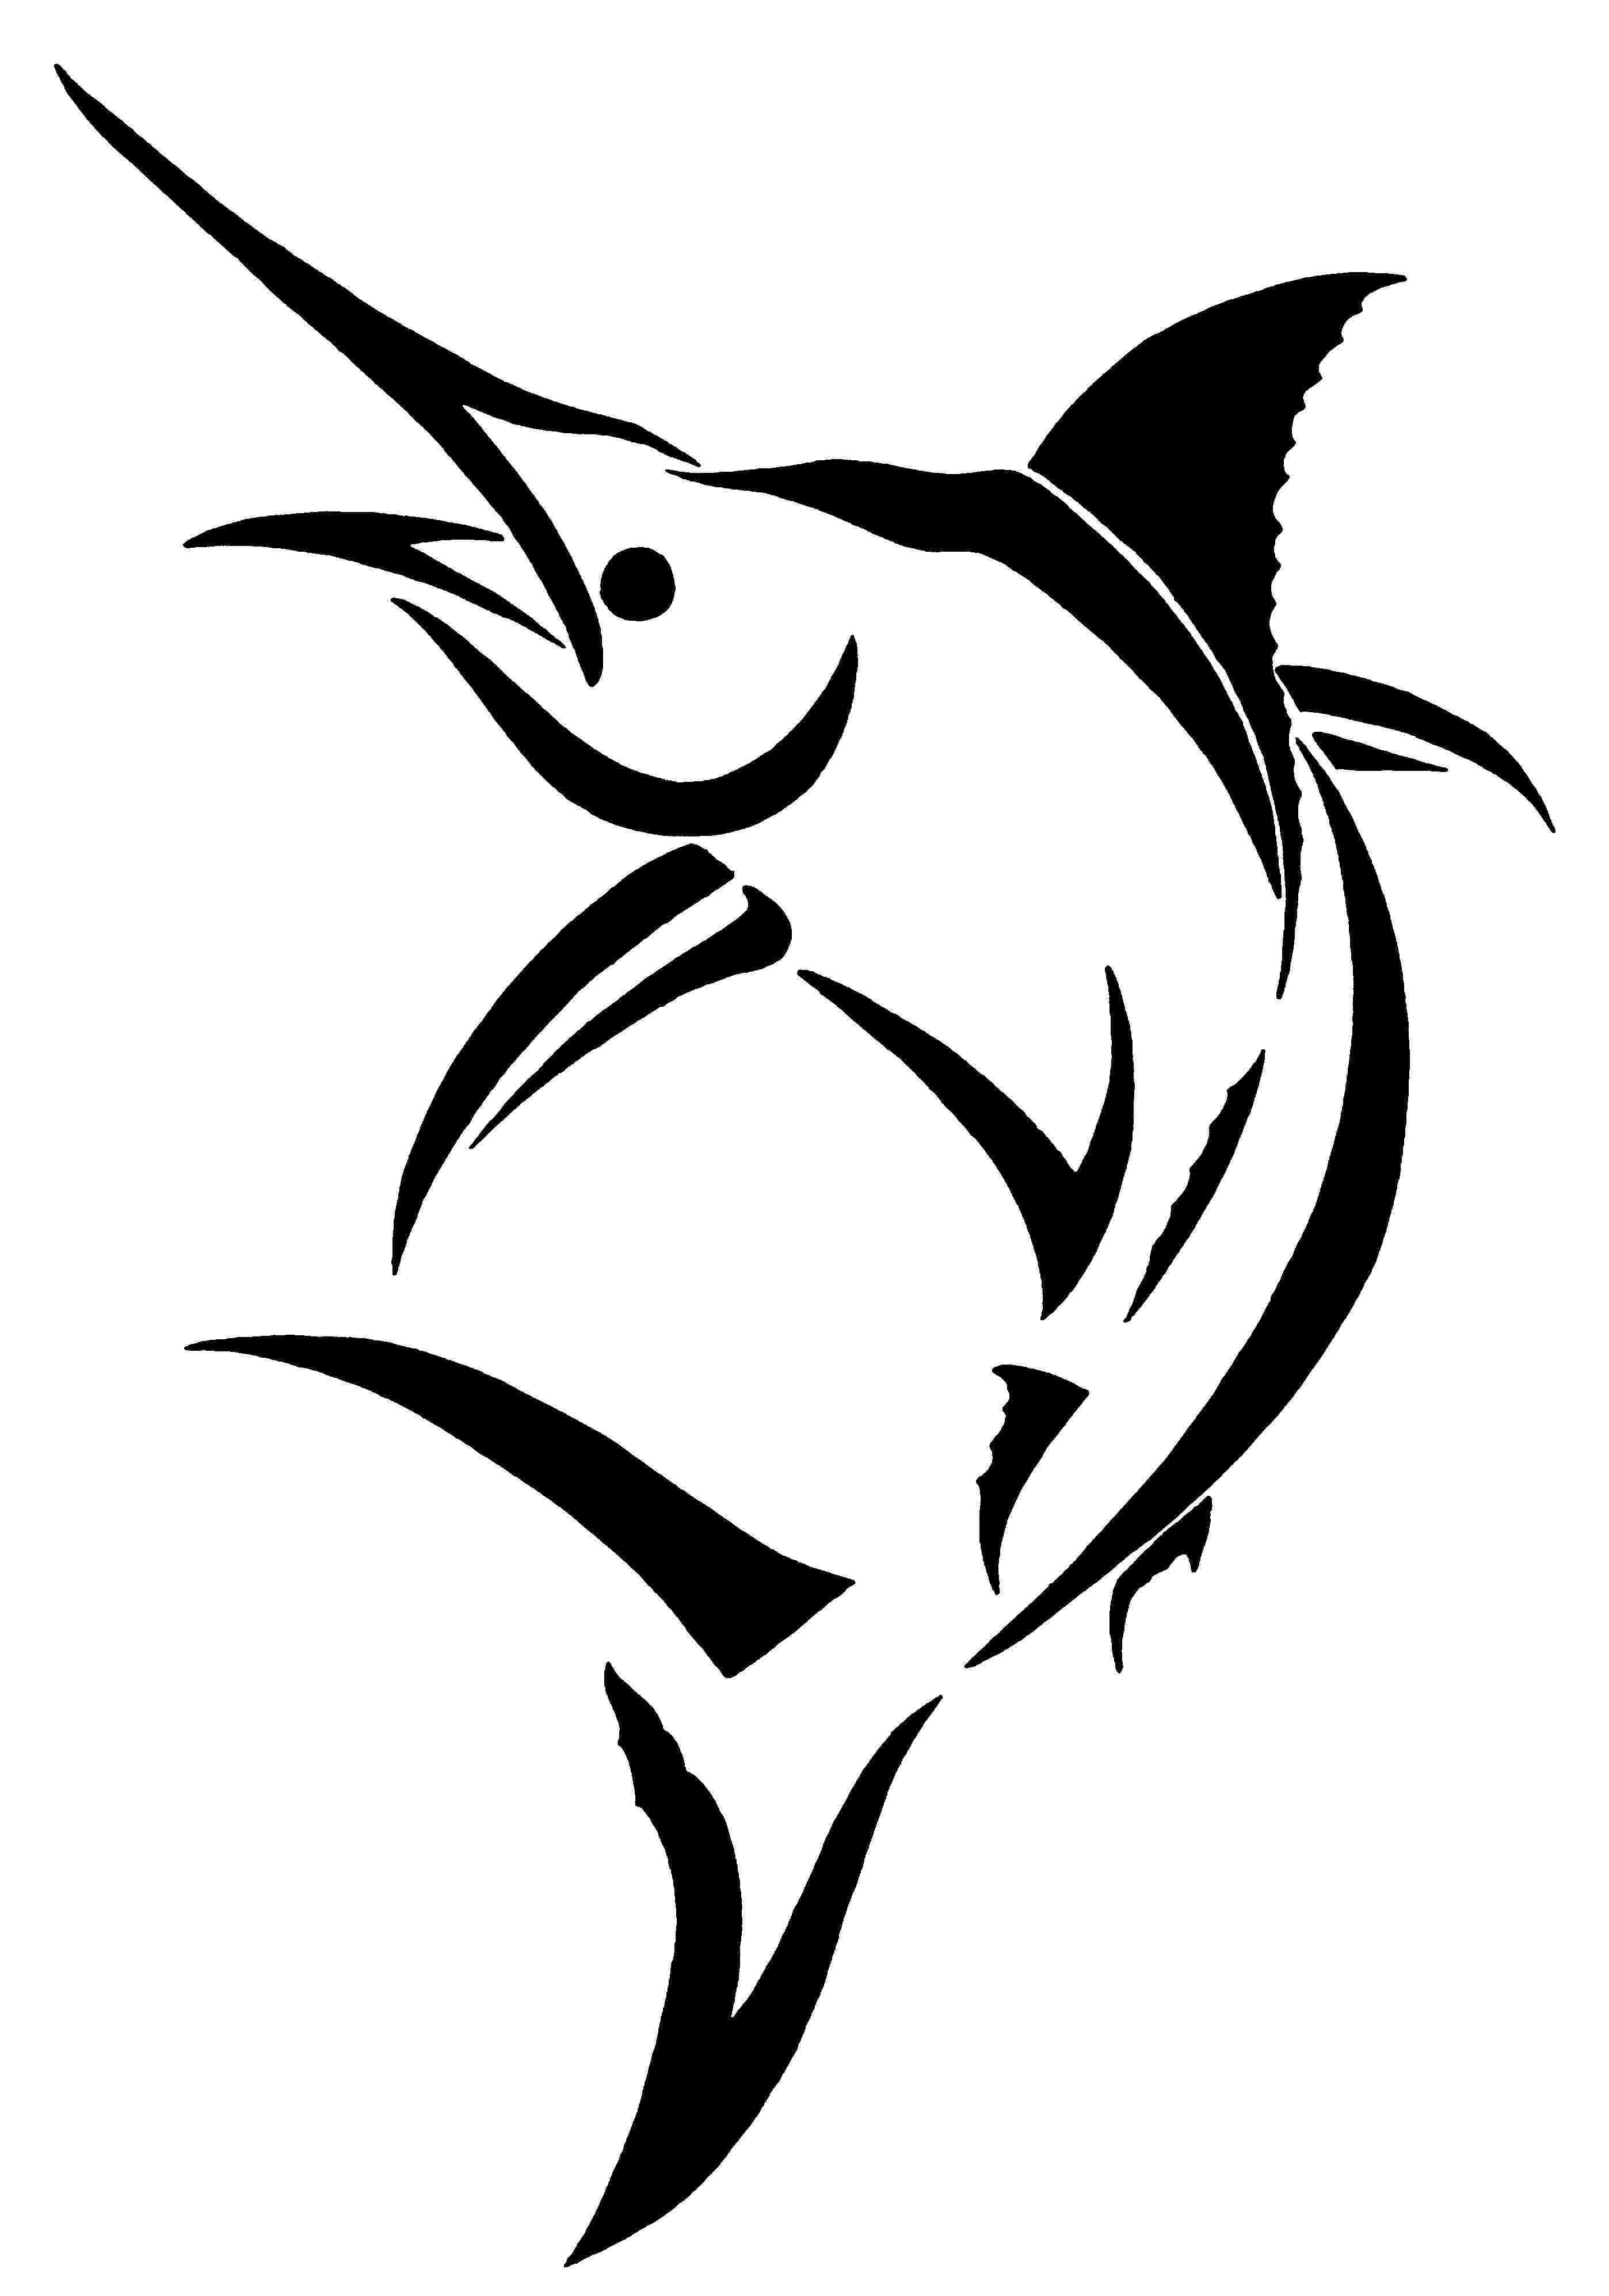 Marlin Clip Art - Cliparts.co